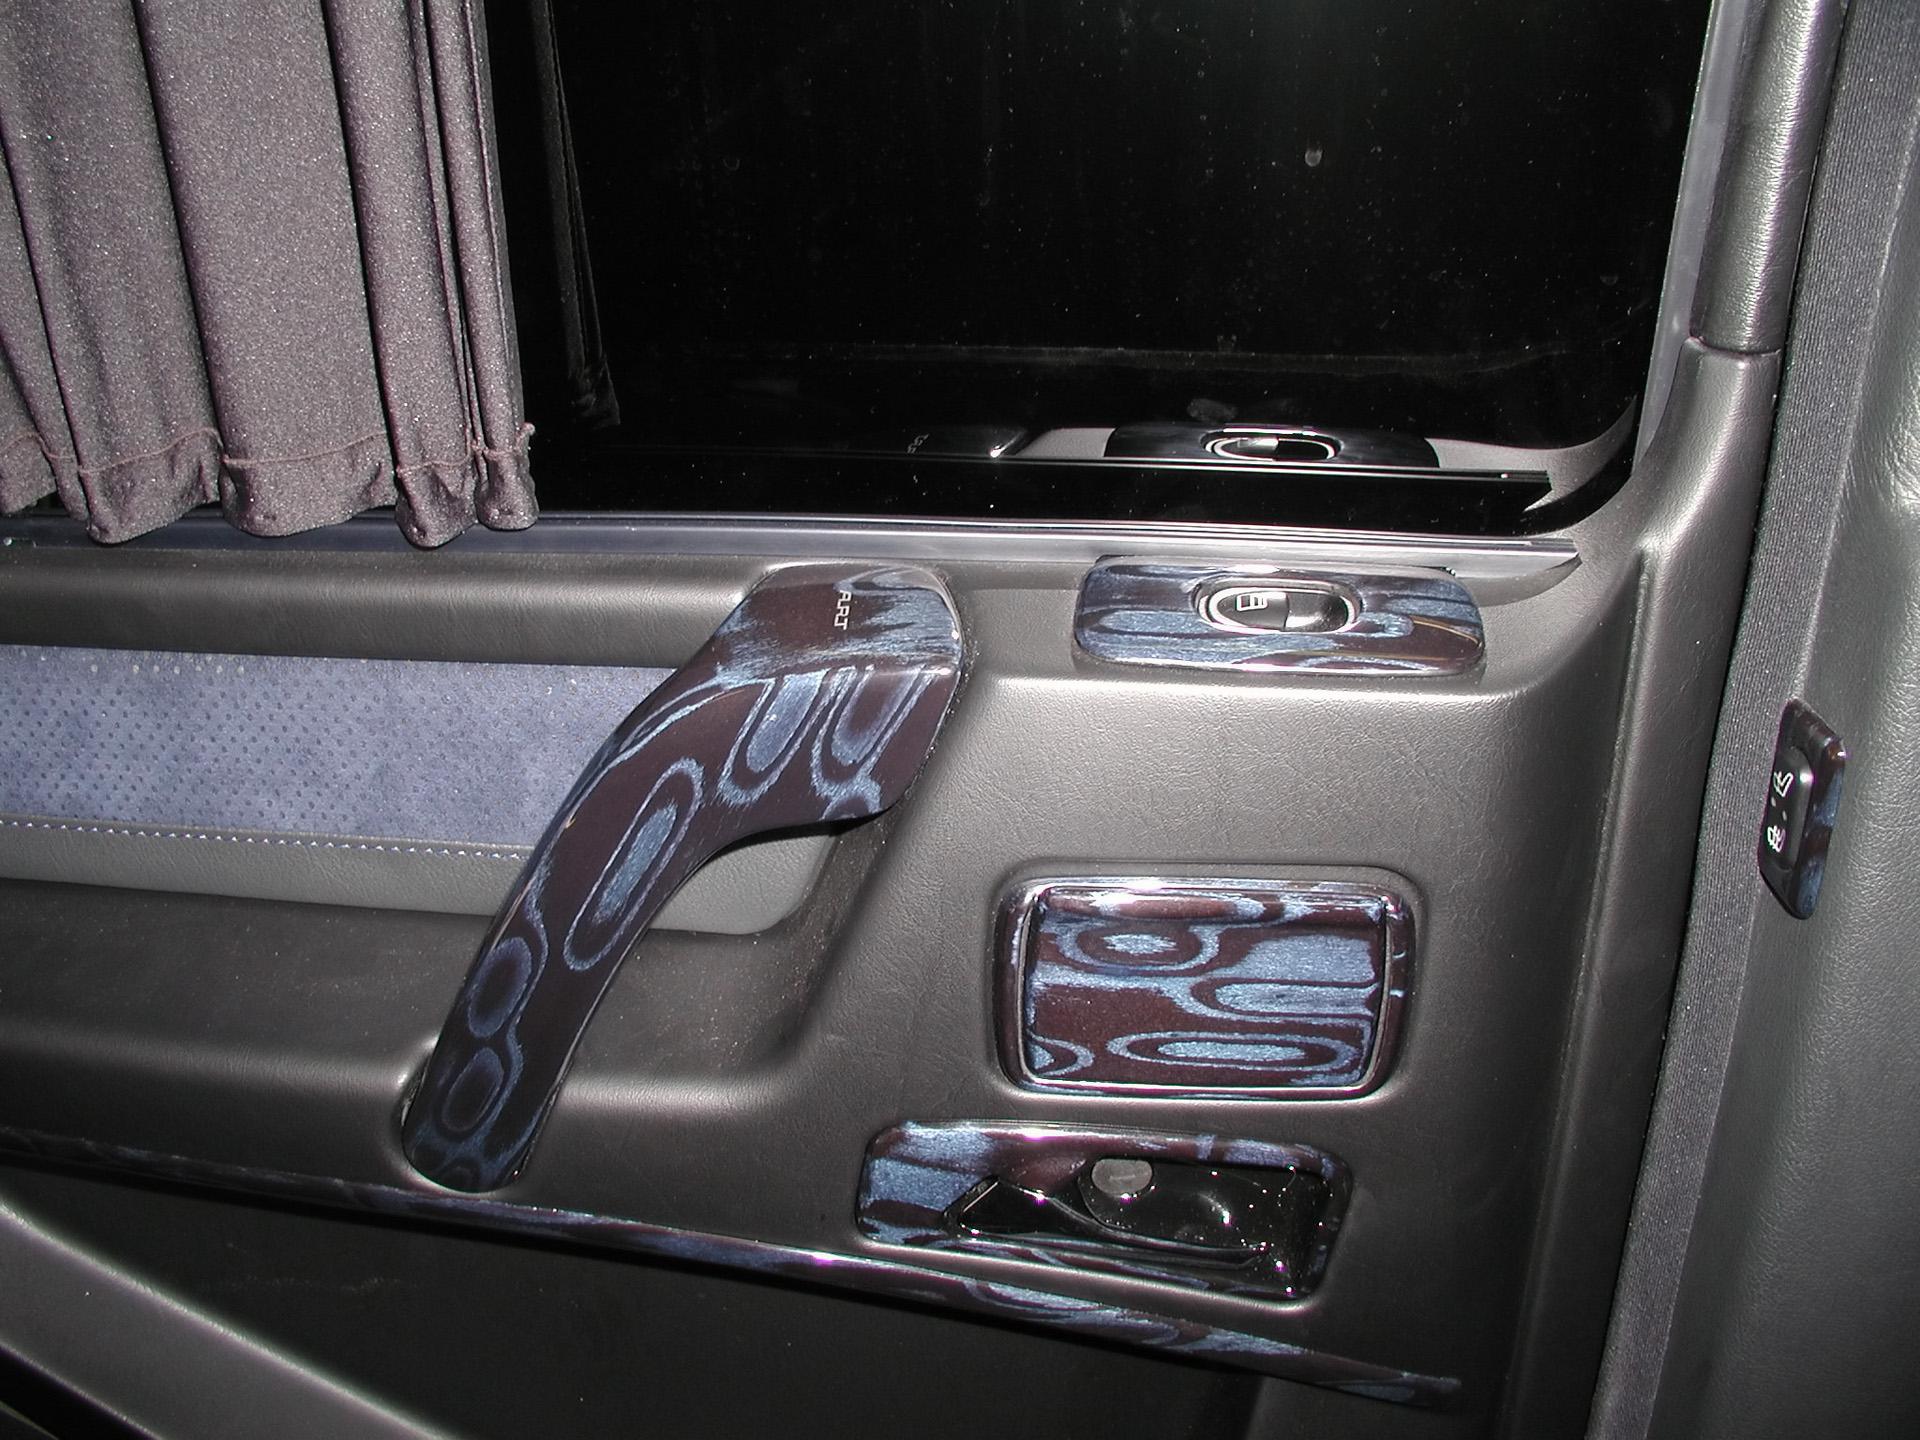 2008 mercedes benz g class 12 mercedes benz g class 12